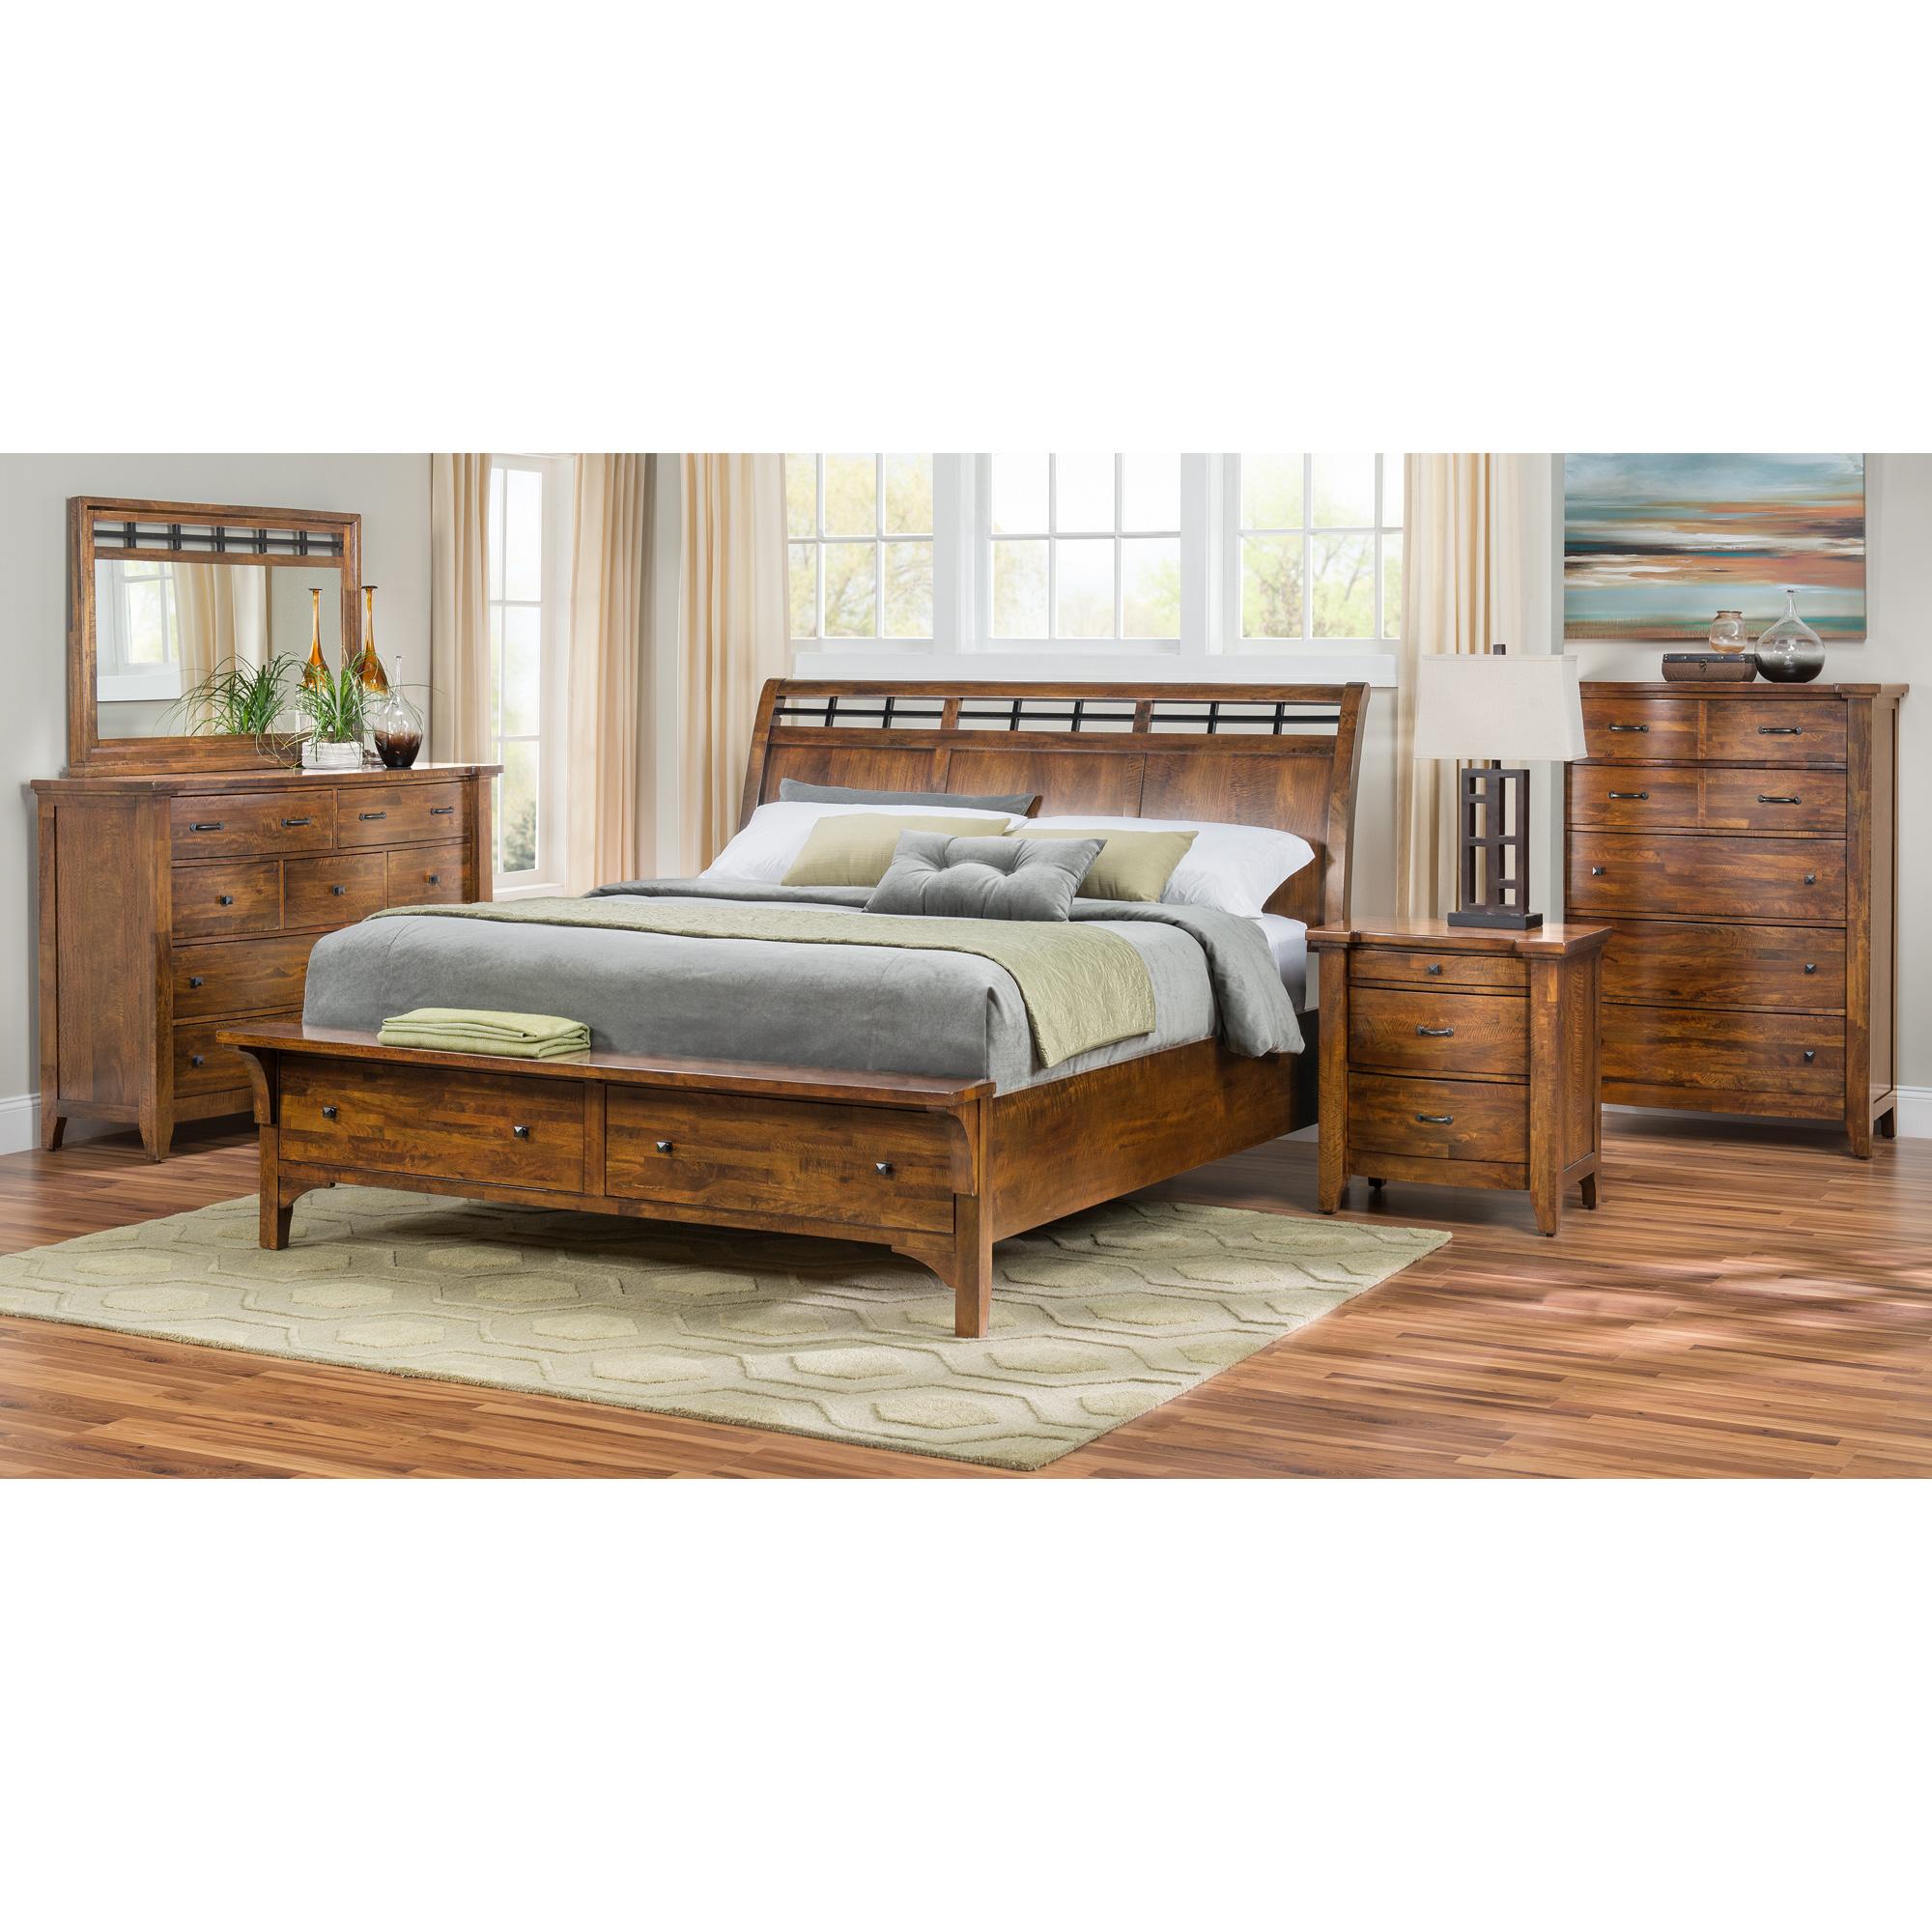 Napa Furniture   Whistler Retreat Dark Walnut Queen Storage 4 Piece Room Group Bedroom Set